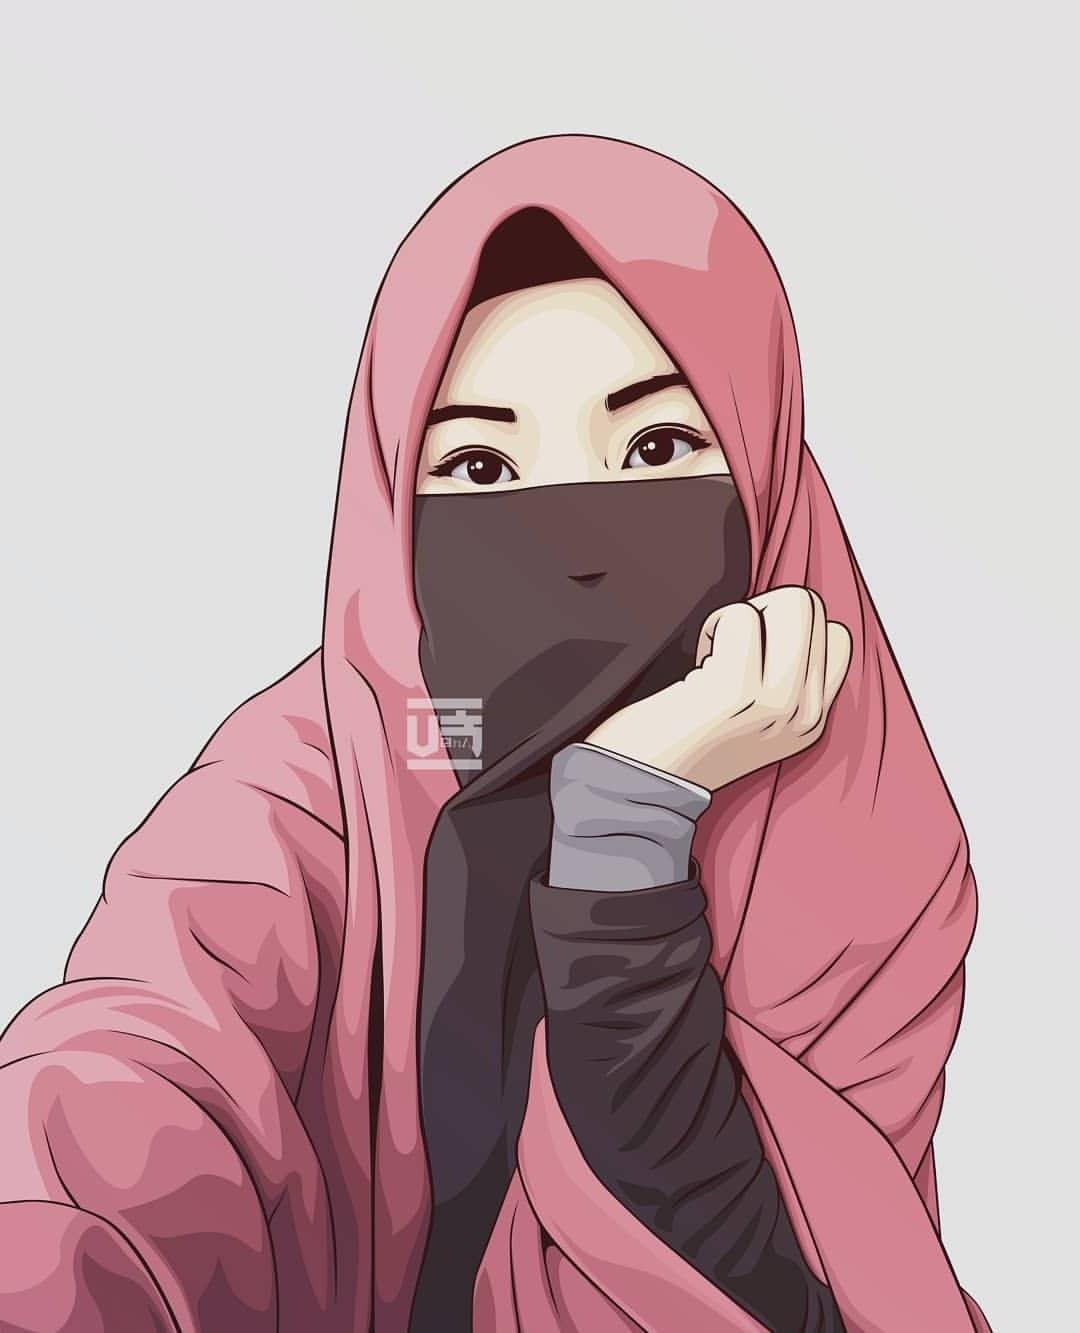 Design Muslimah Bercadar Kartun Q0d4 1000 Gambar Kartun Muslimah Cantik Bercadar Kacamata El